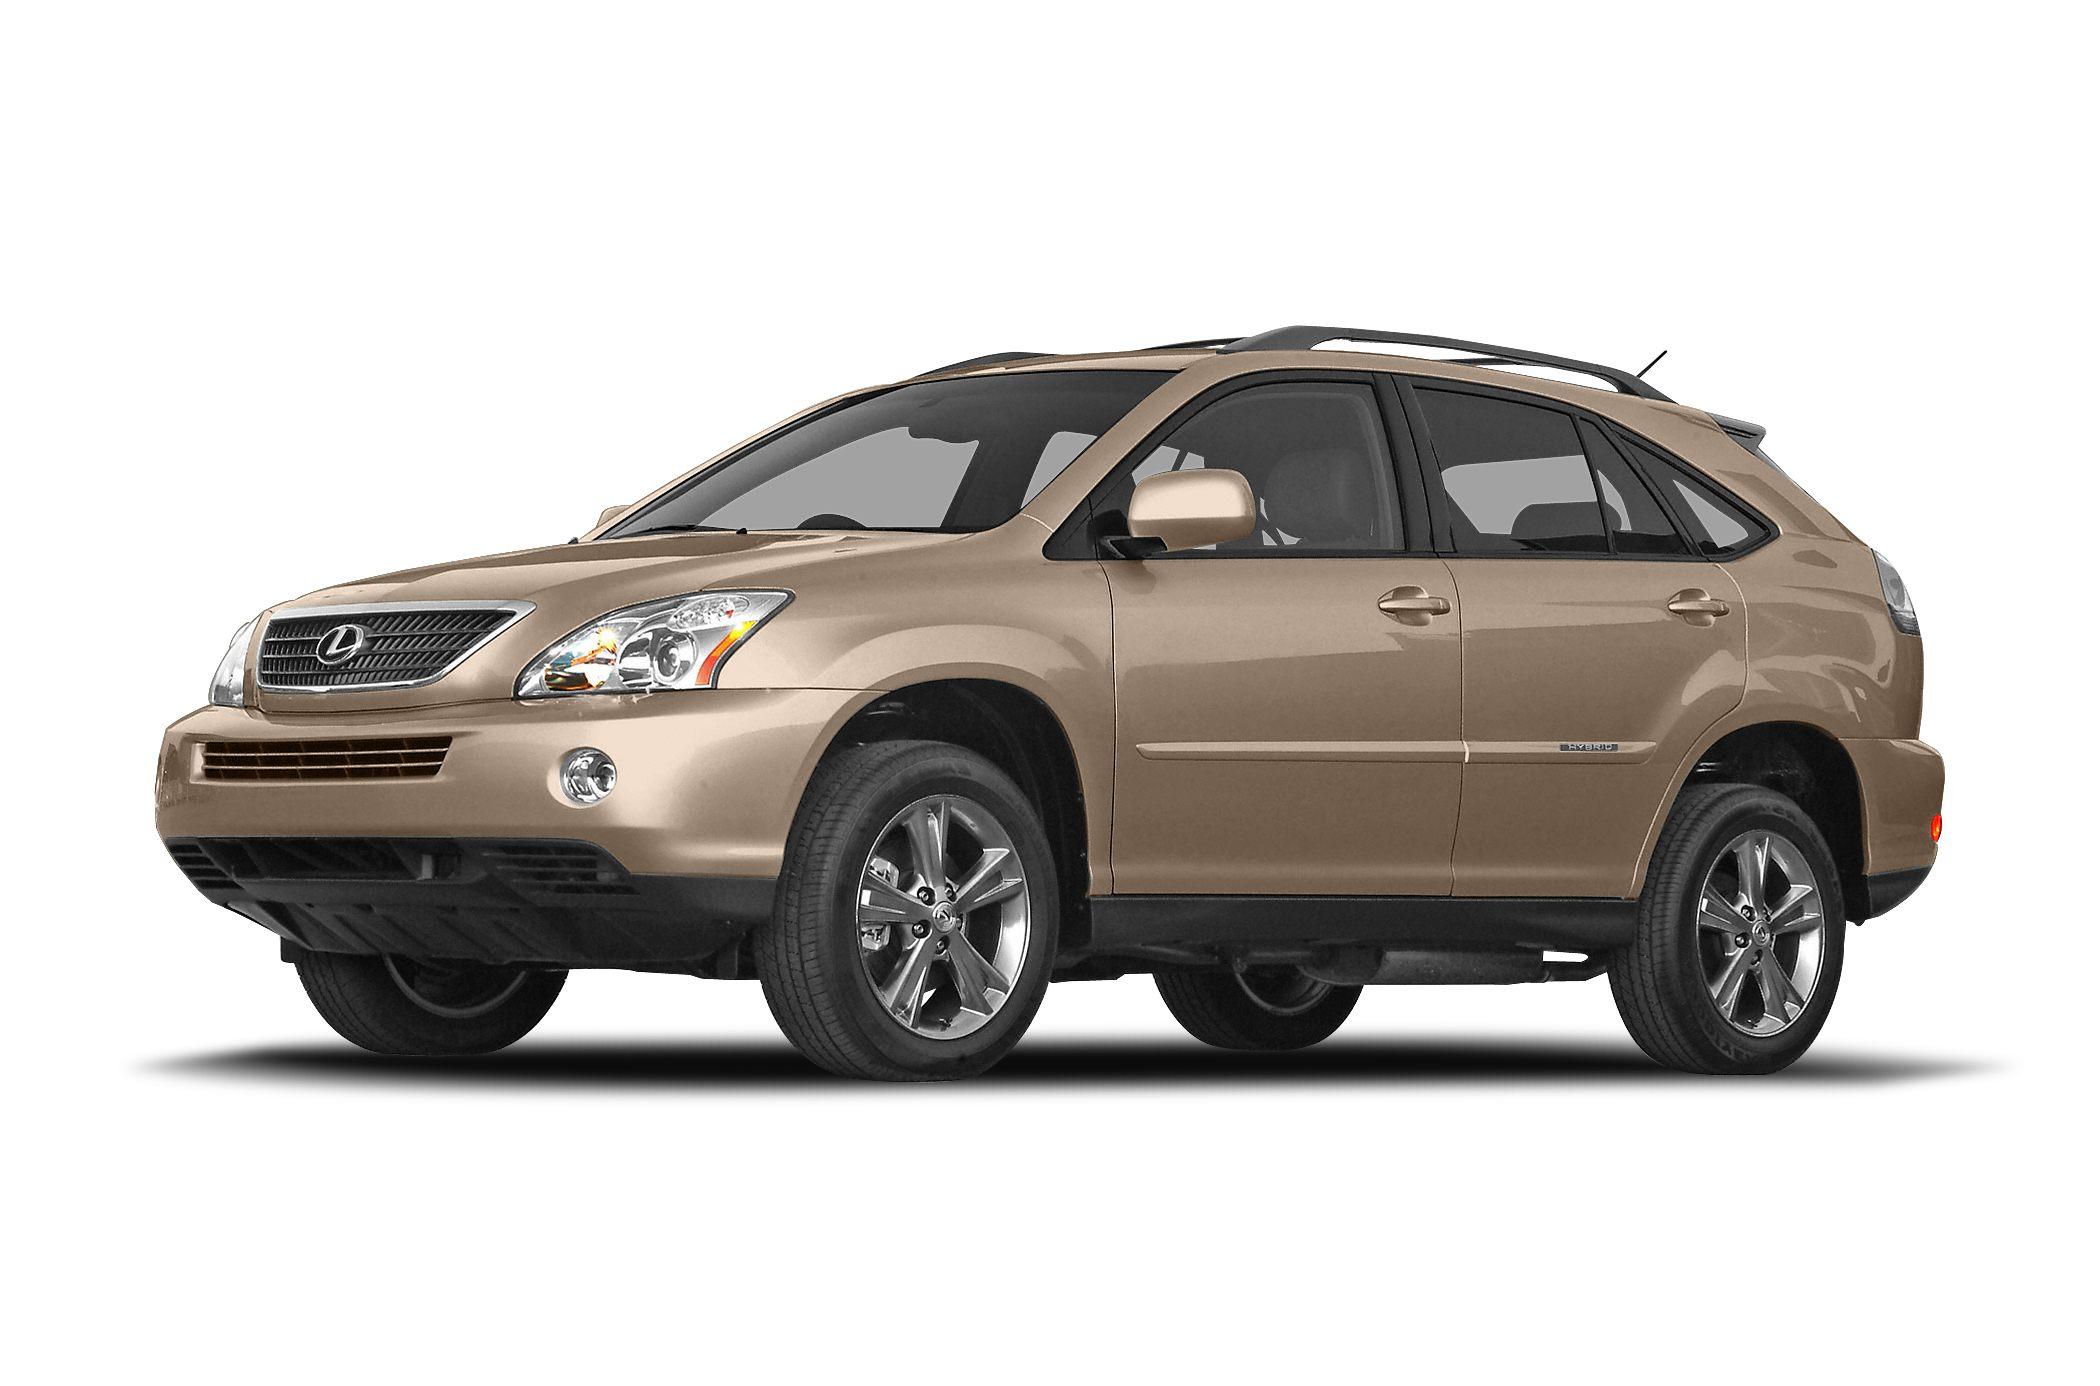 2008LexusRX 400h